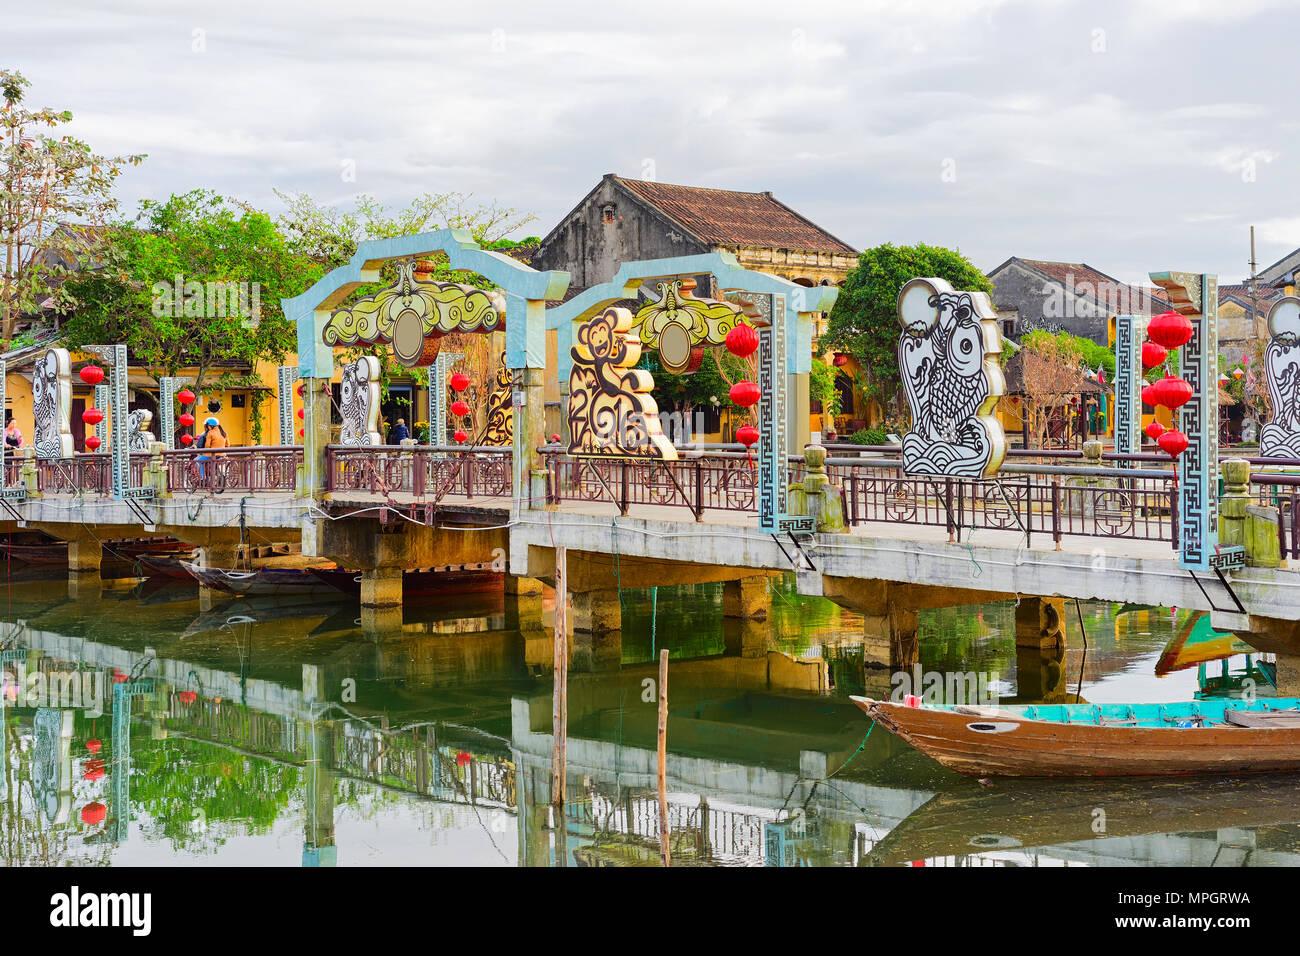 Hoi An, Vietnam - February 17, 2016: Boat near the Embankment of Thu Bon River, Hoi An, Vietnam Stock Photo